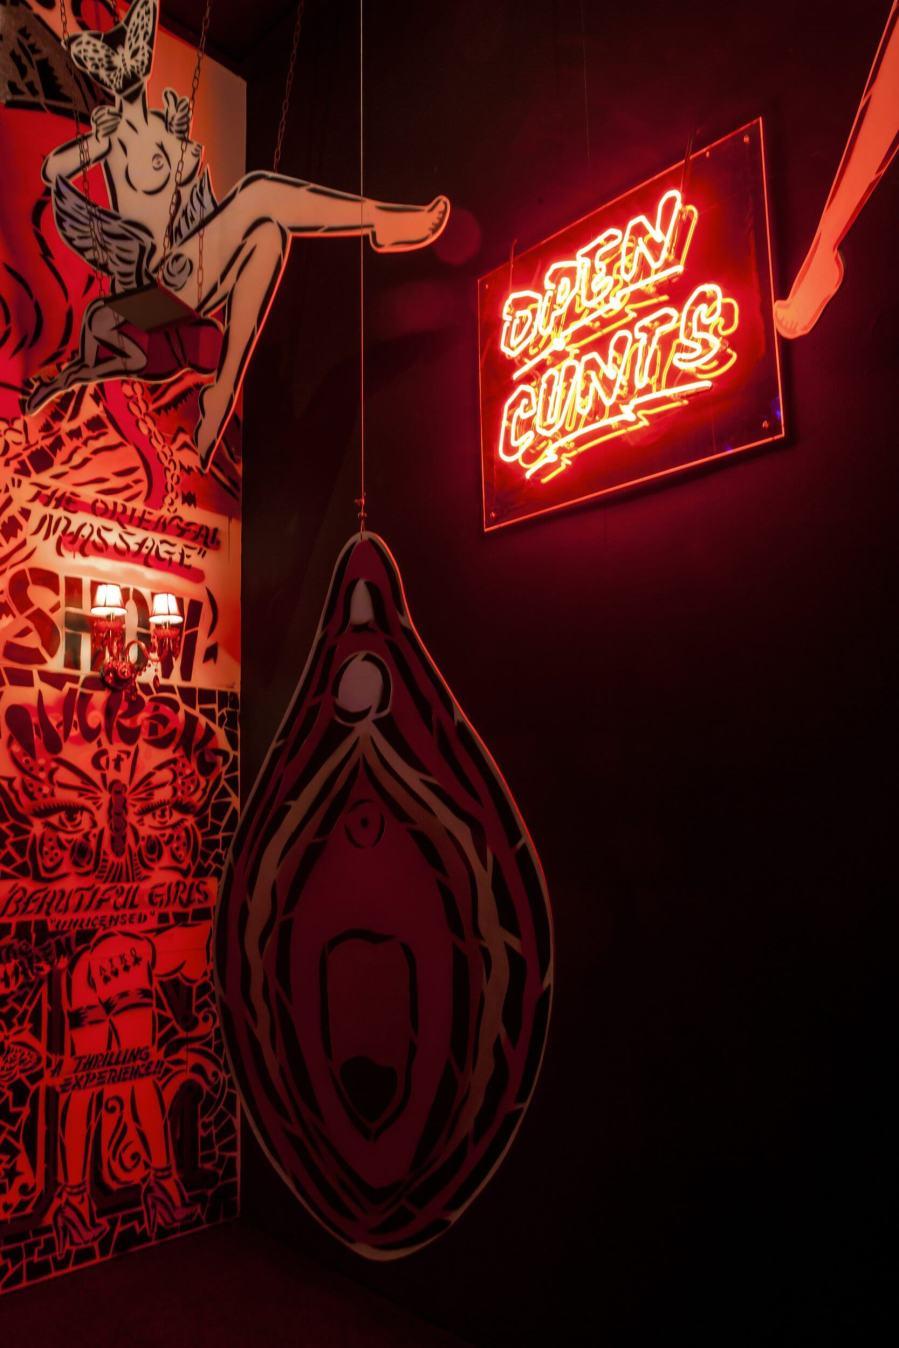 Aiko, Magic City, Street Art Exhibition, Dresden, Germany. Photo Credit Rainer Christian Kurzeder